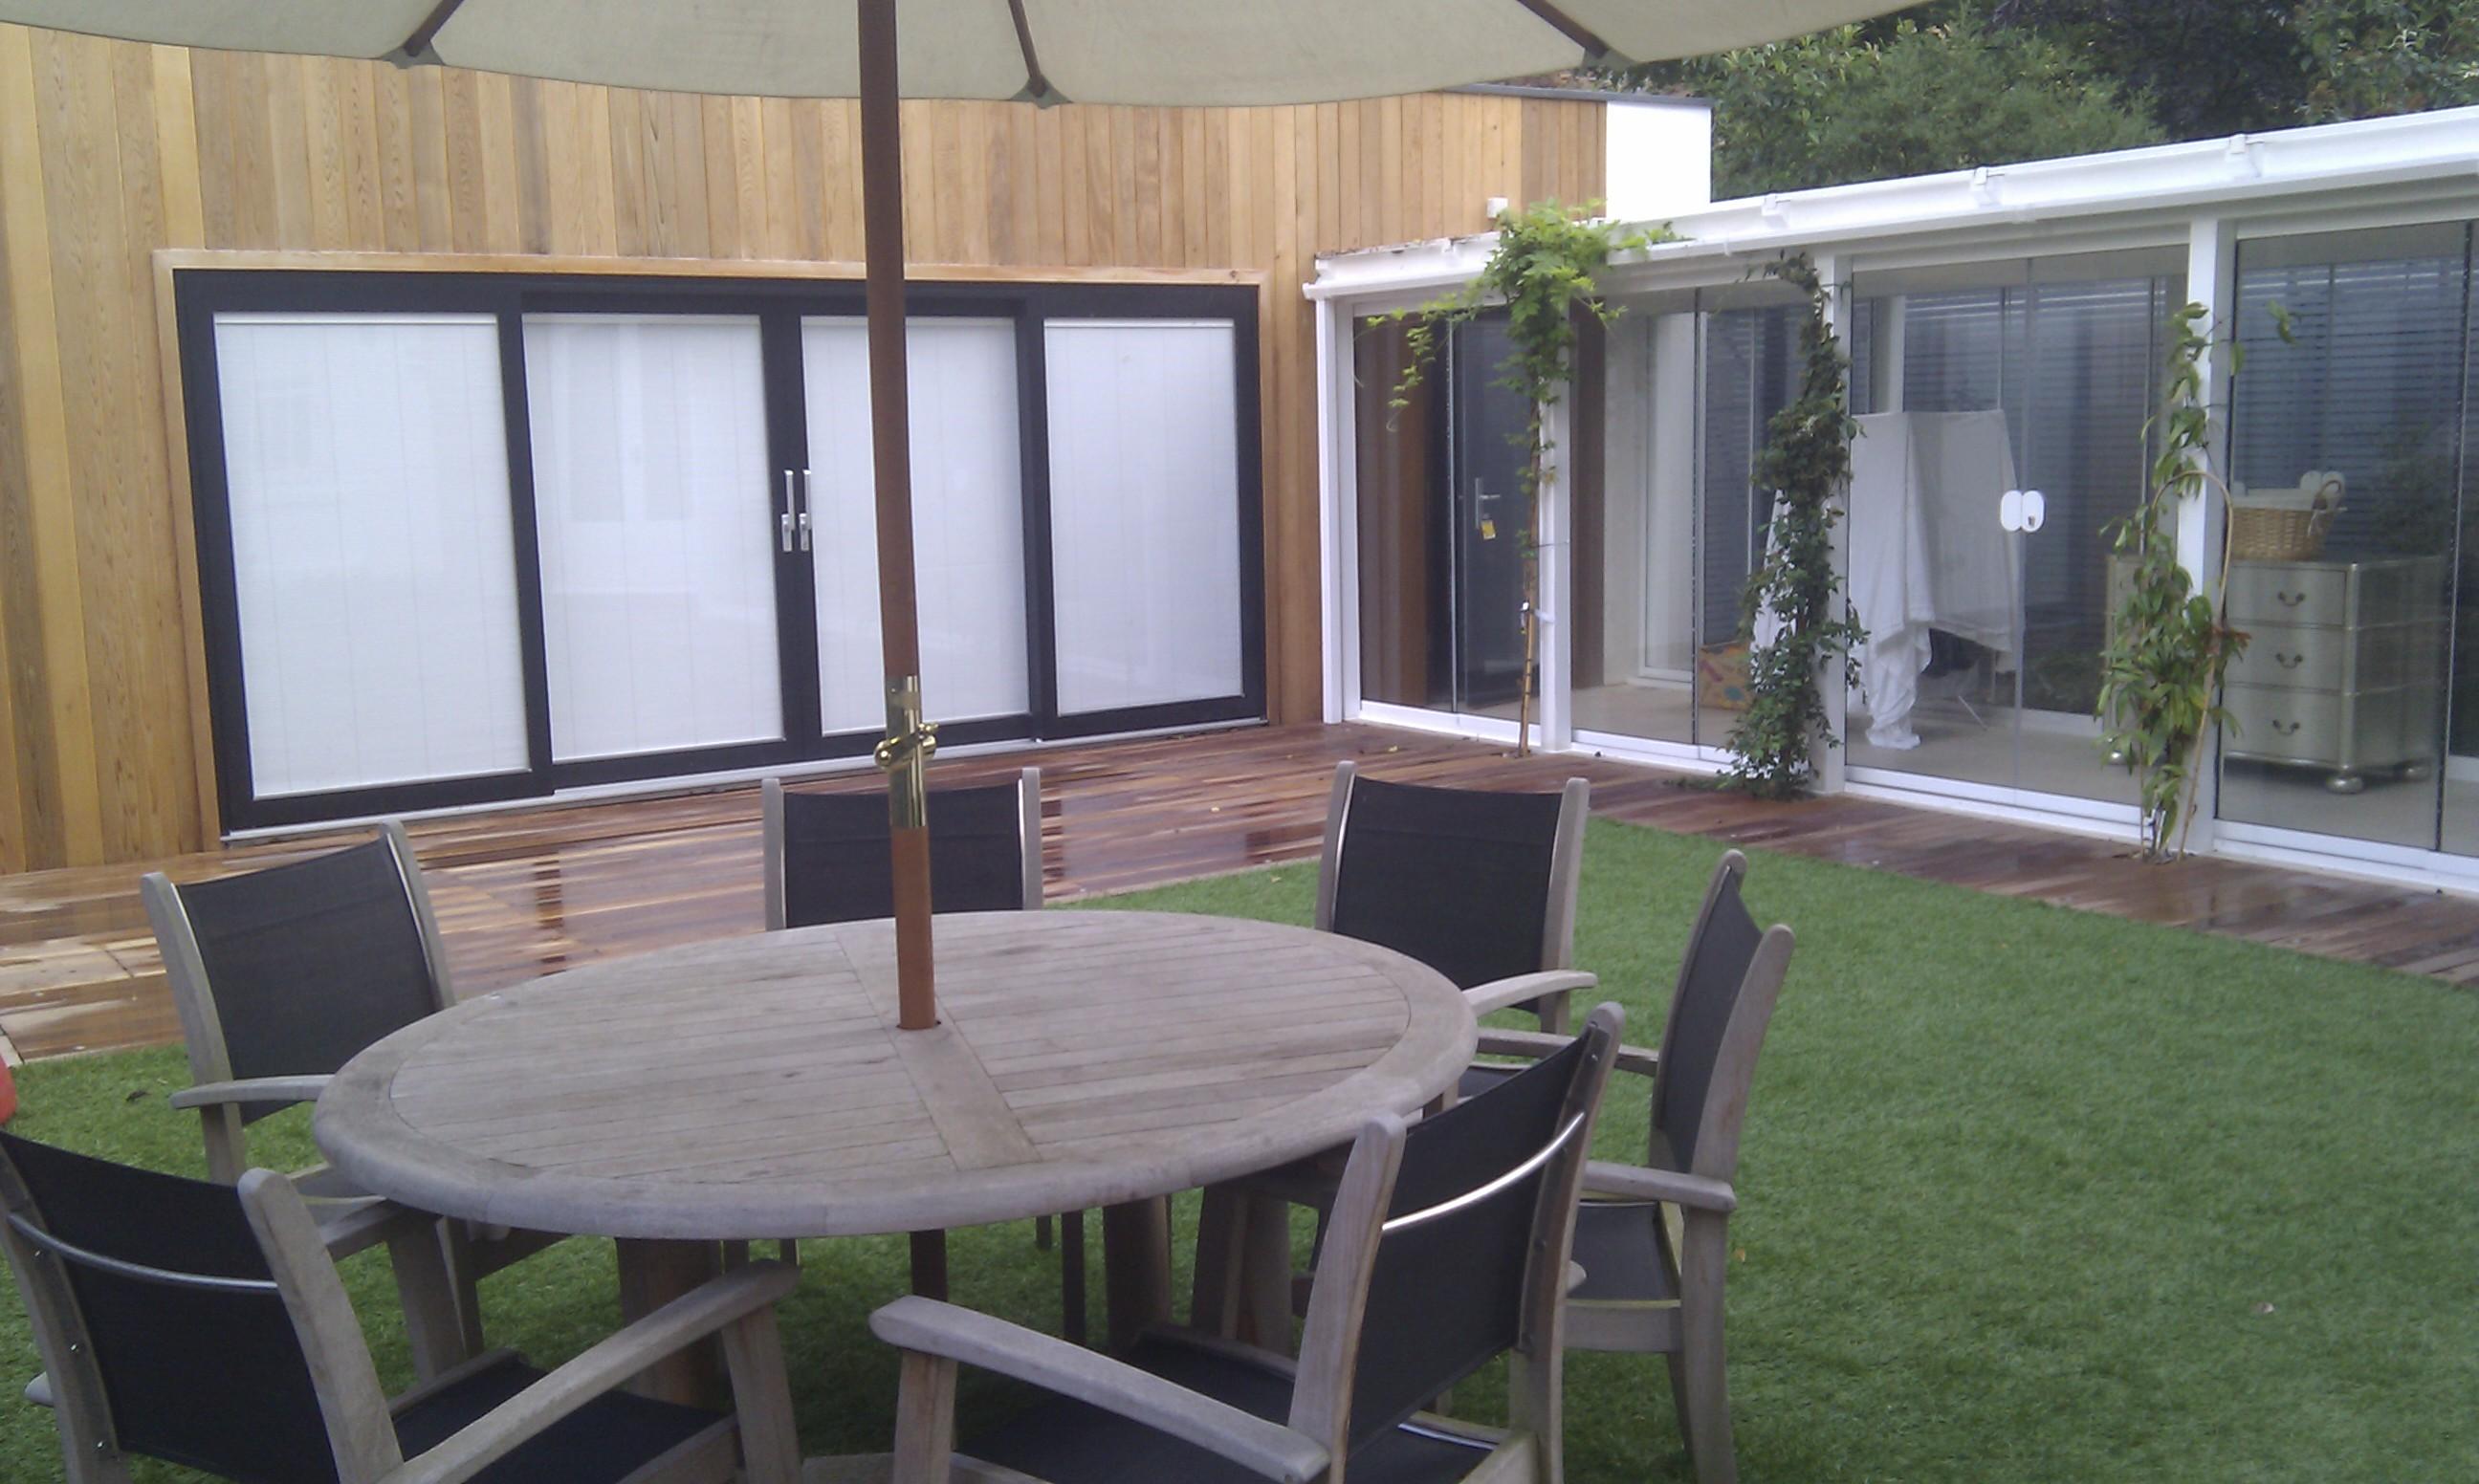 modern garden design london slatted grey privacy screen sandstone paving easy grass balau hardwood decking (38)